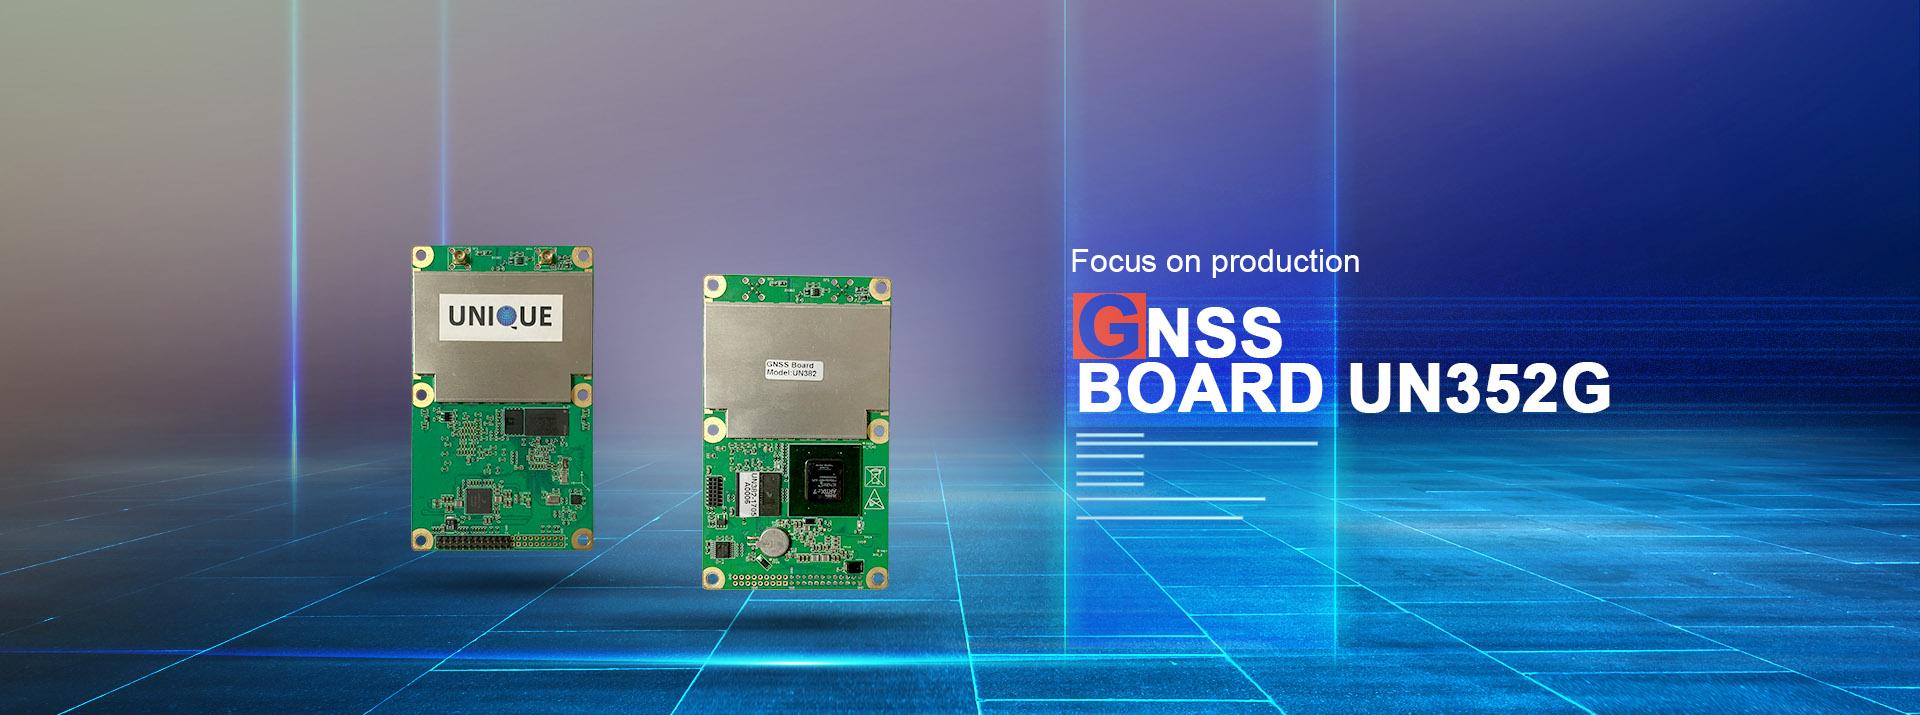 GNSS Consiglio UN352G